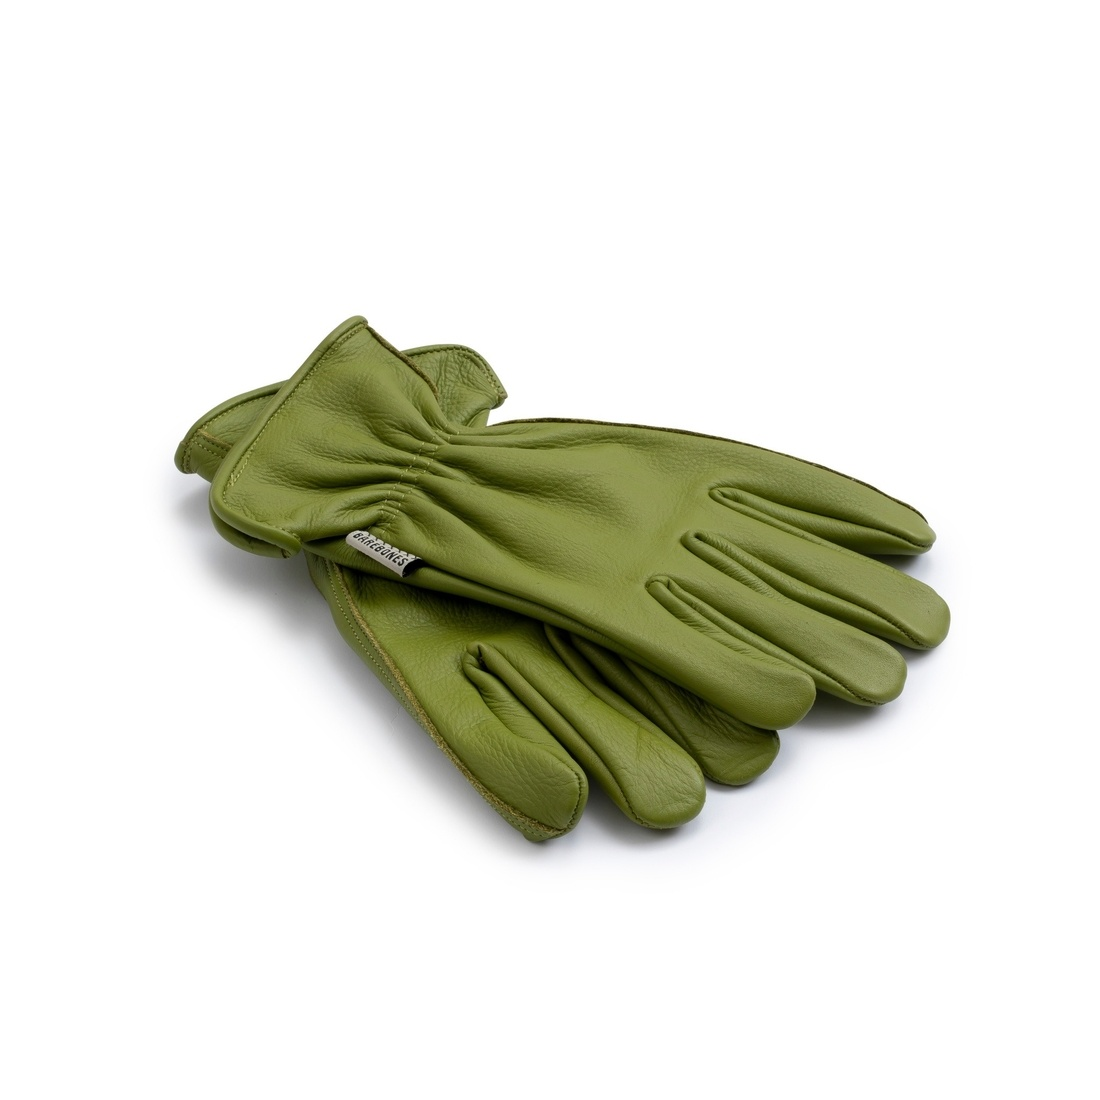 Barebones Classic Work Glove: Olive L/XL